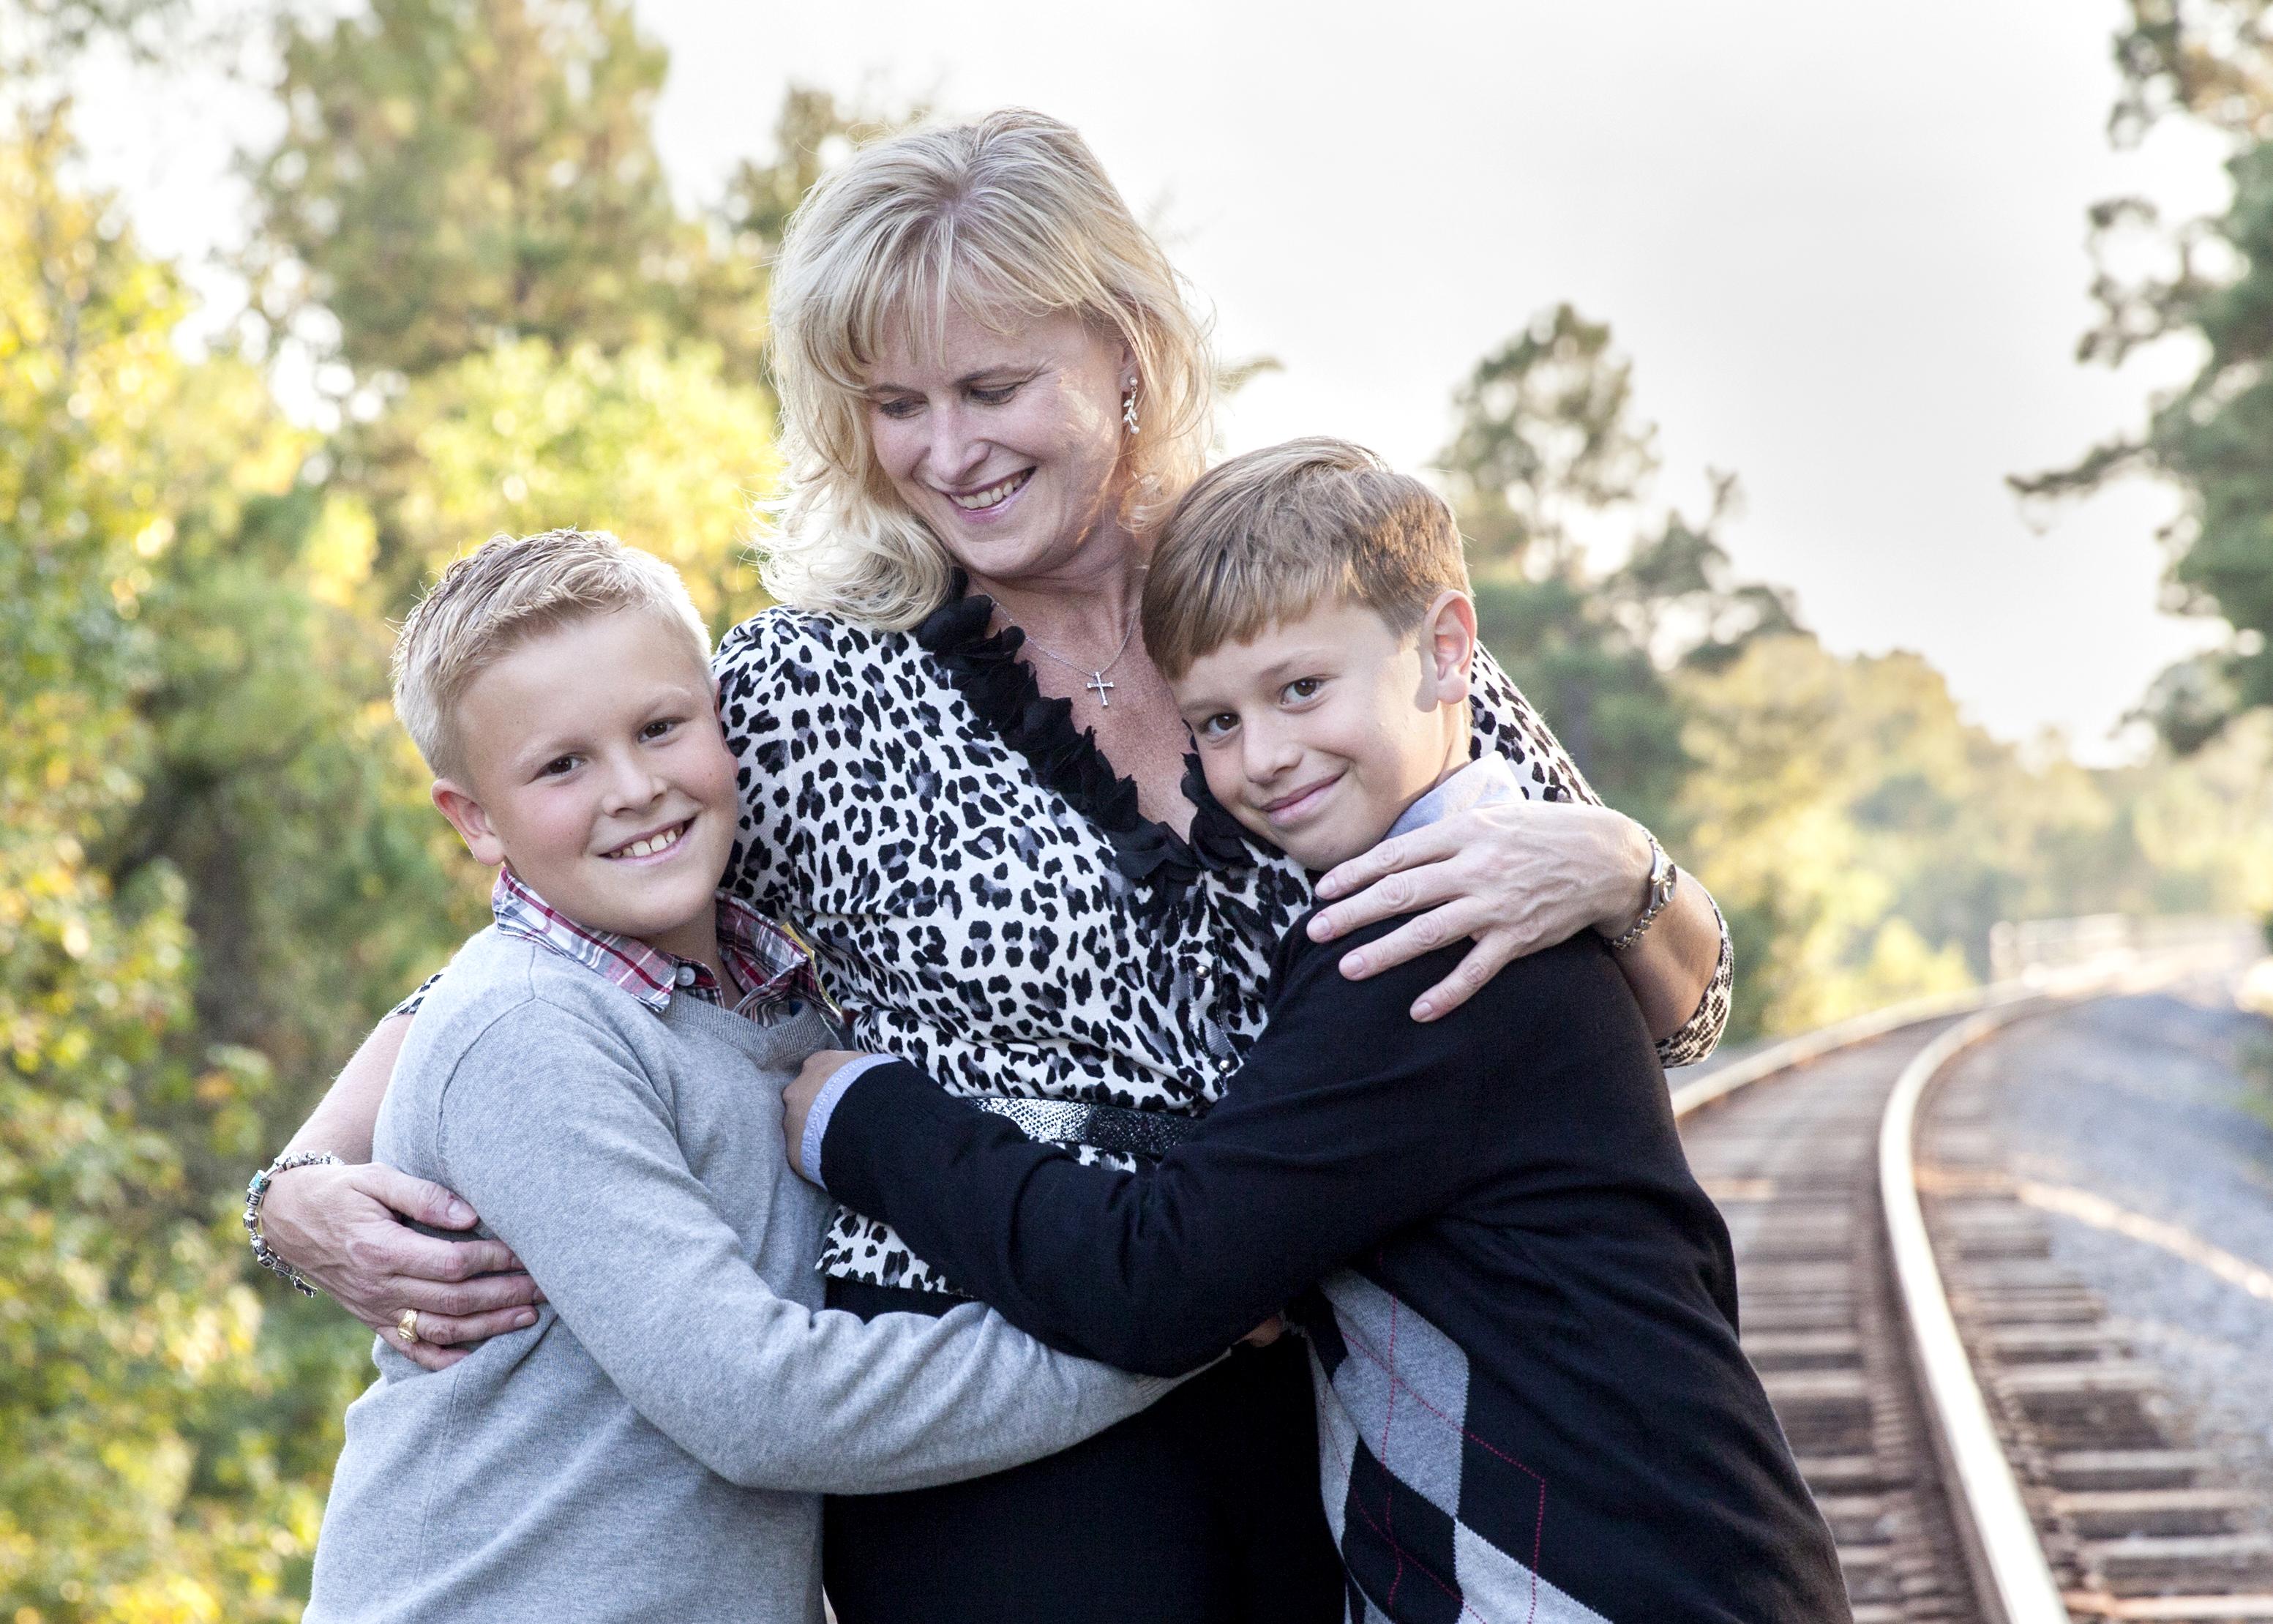 Kingwood family photography